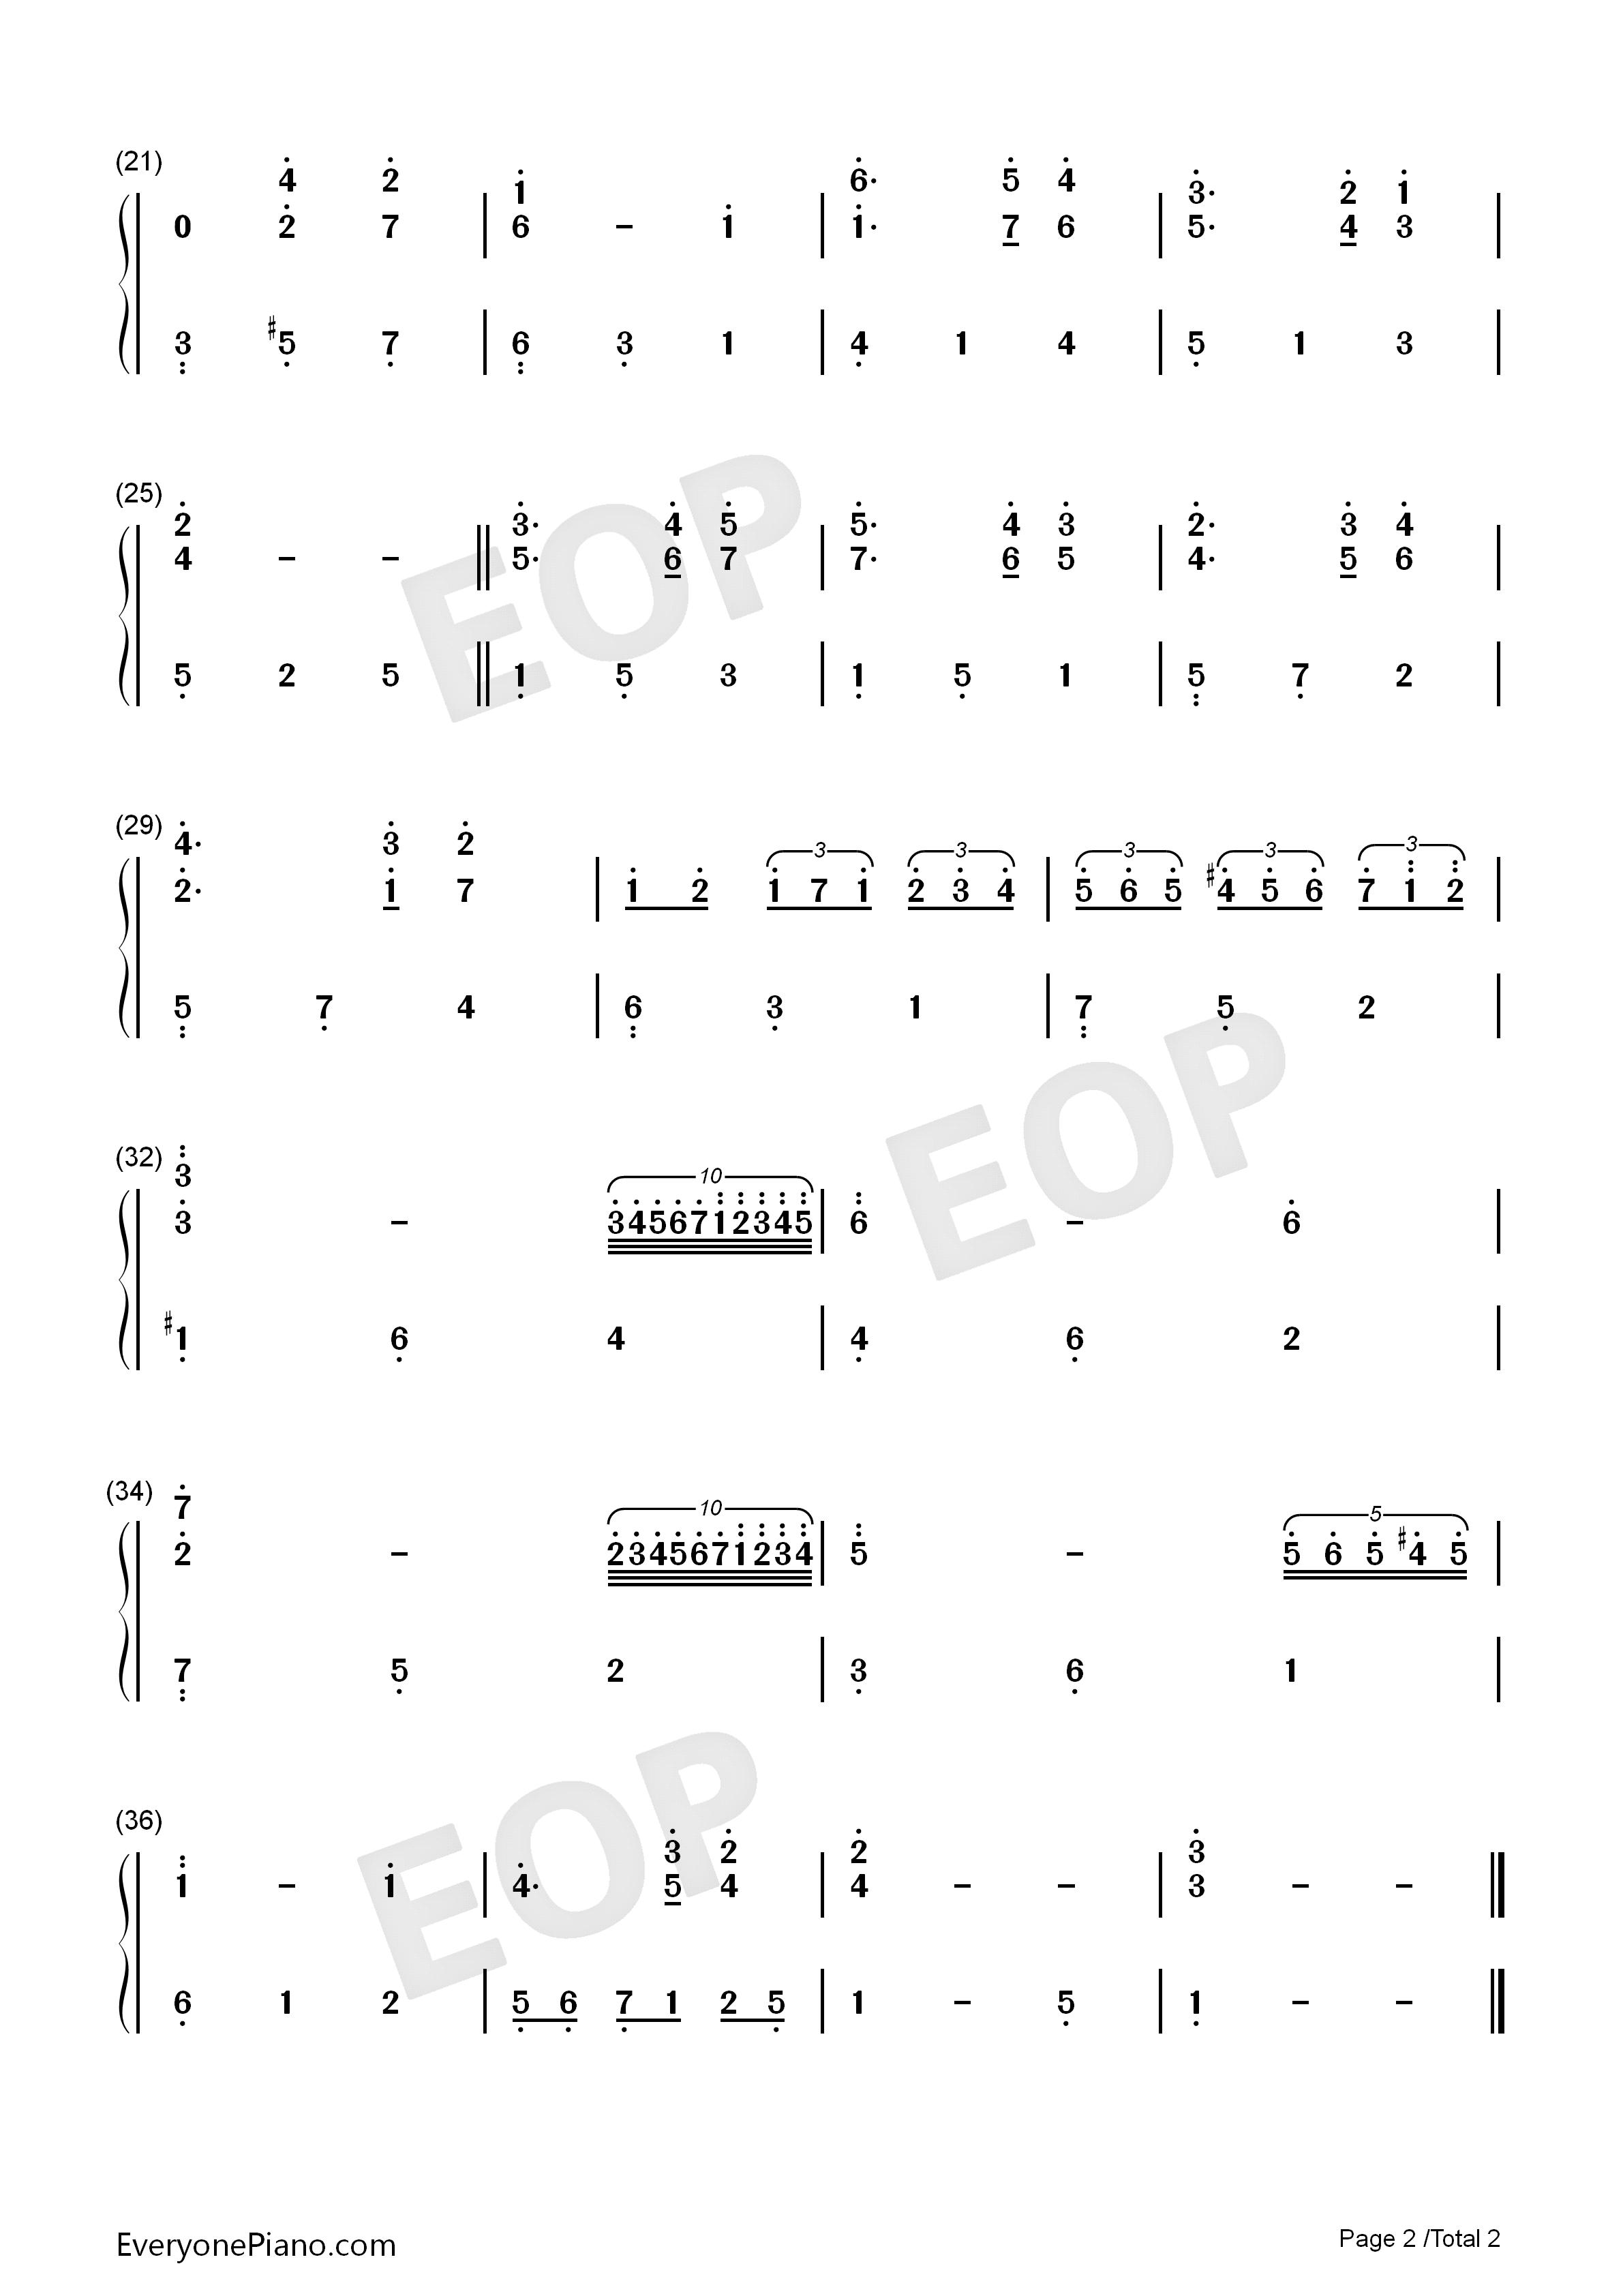 a mozart reincarnated-《海上钢琴师》插曲-eop教学曲双手简谱预览2